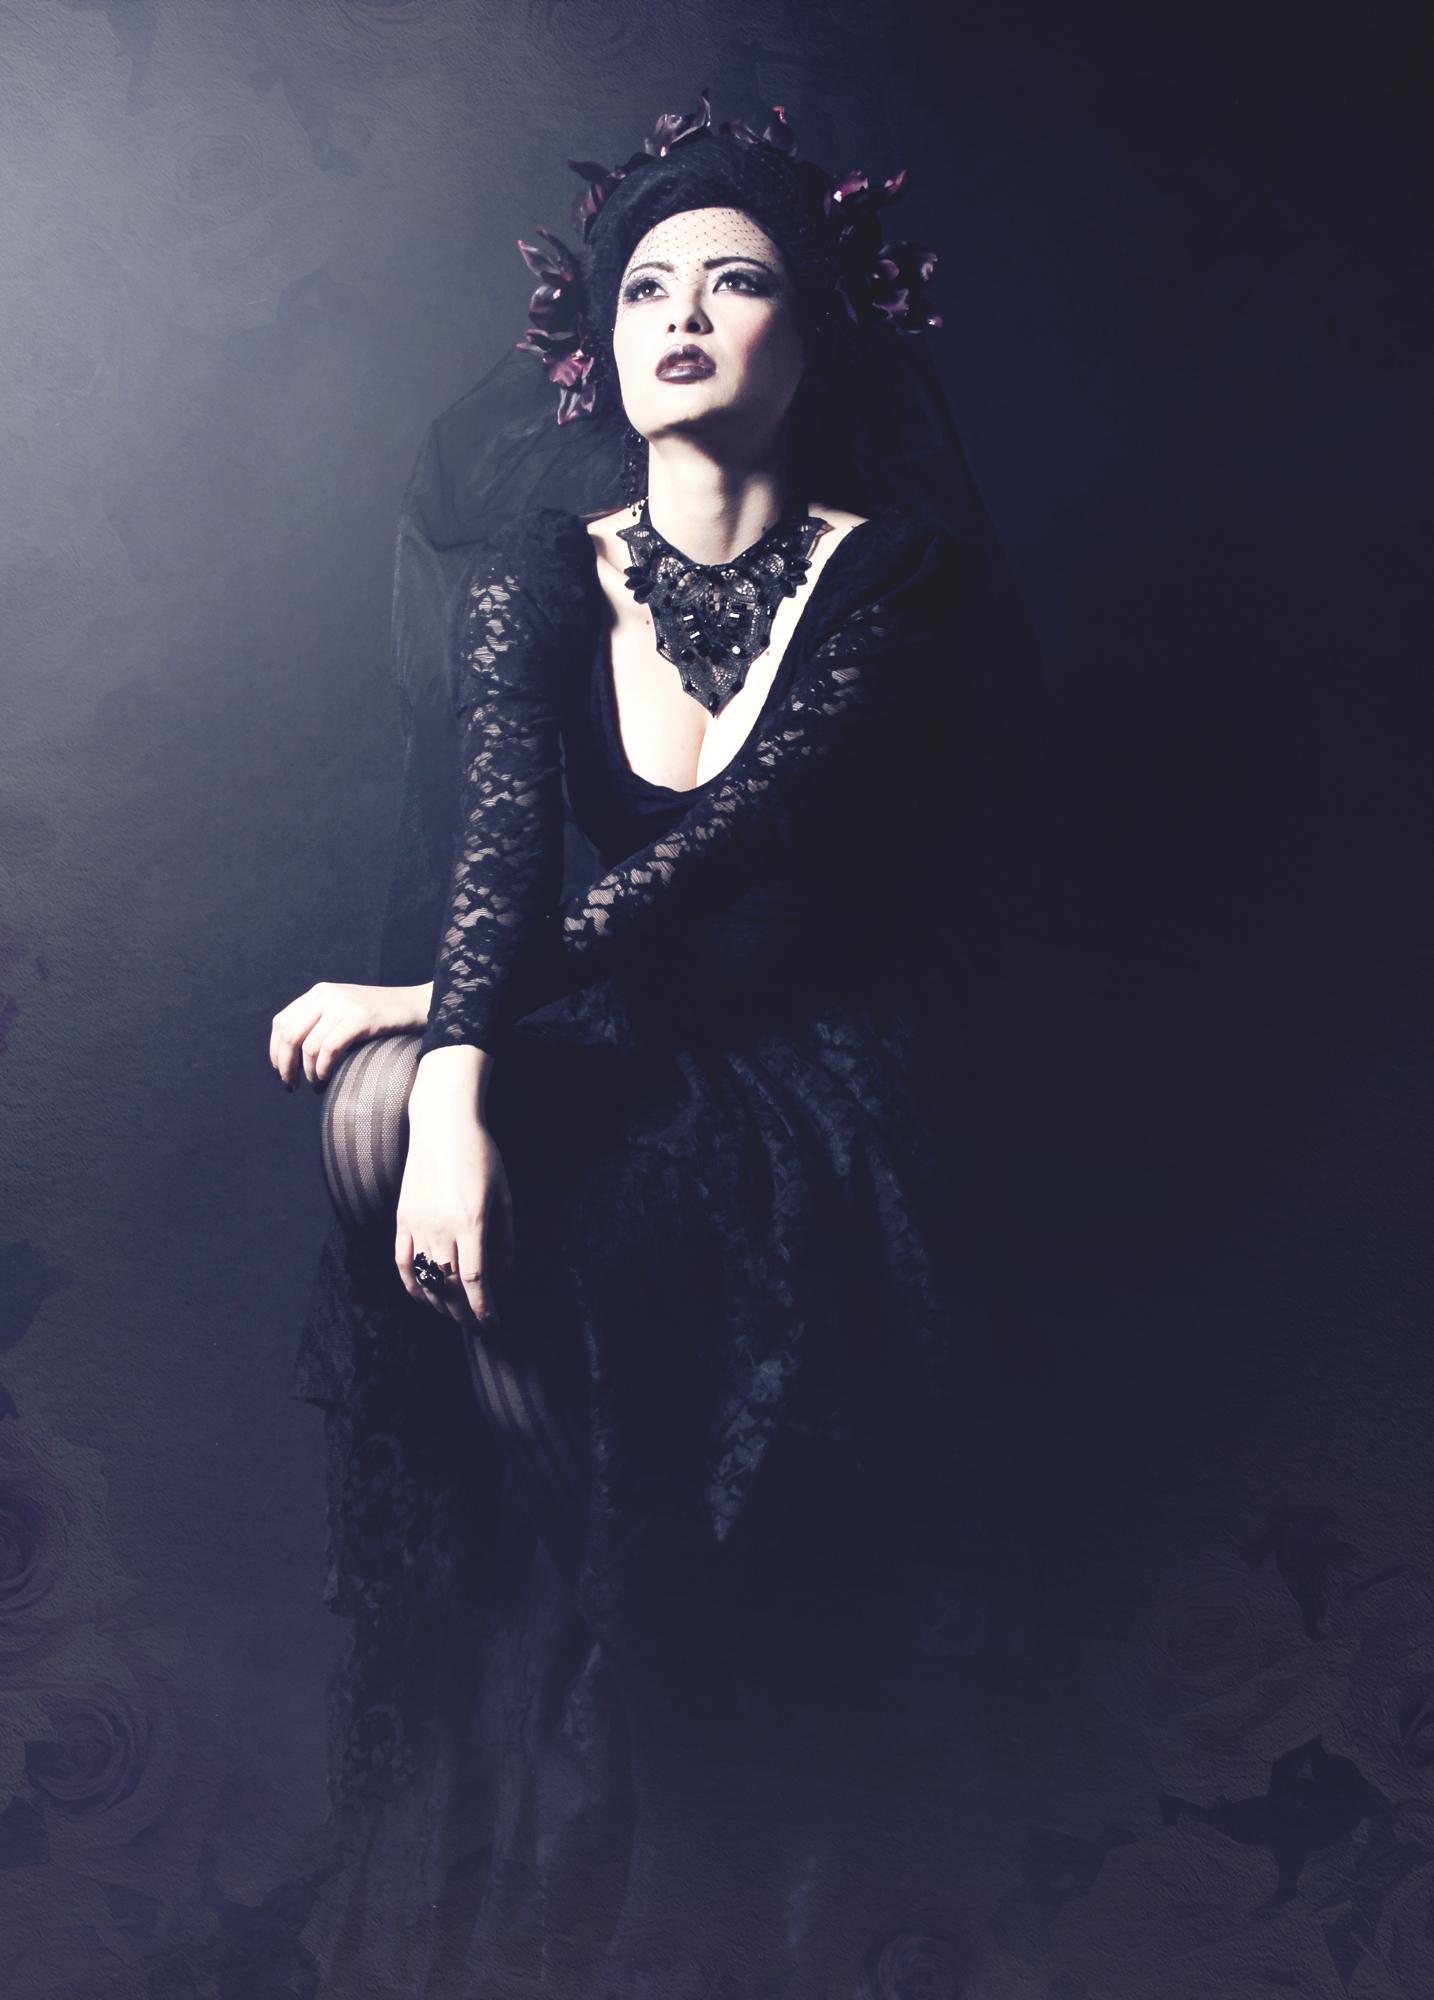 Silke Gabrielle - Lisa Ryland (Lisa-Kikui) - hair makeup stylist is phtog